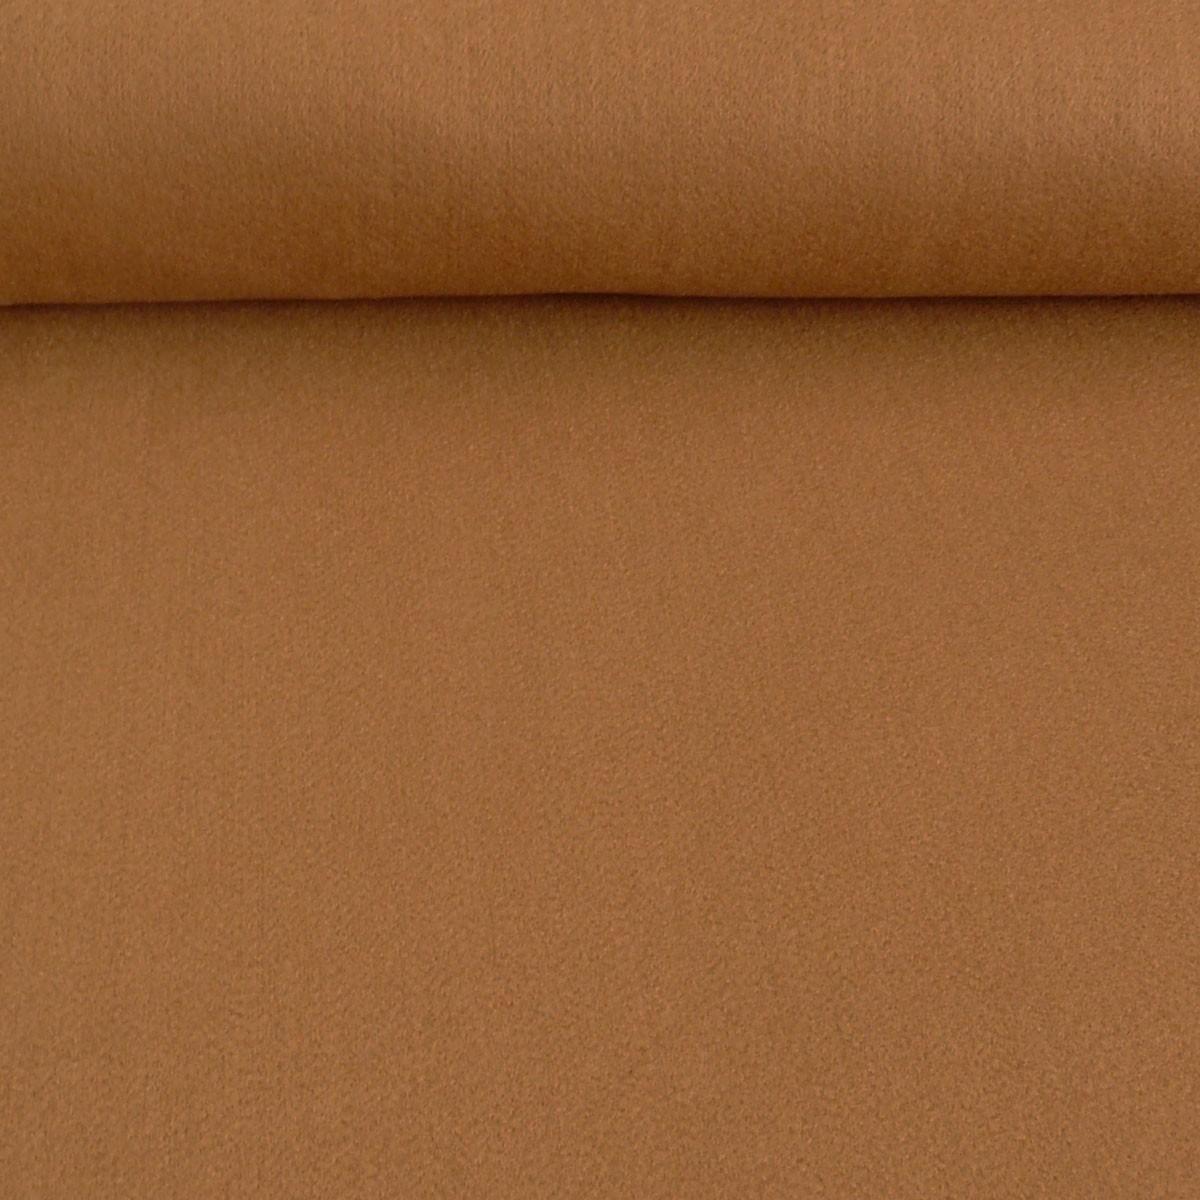 Kreativstoff Filz einfarbig hellbraun 180cm Breite 2mm Stärke